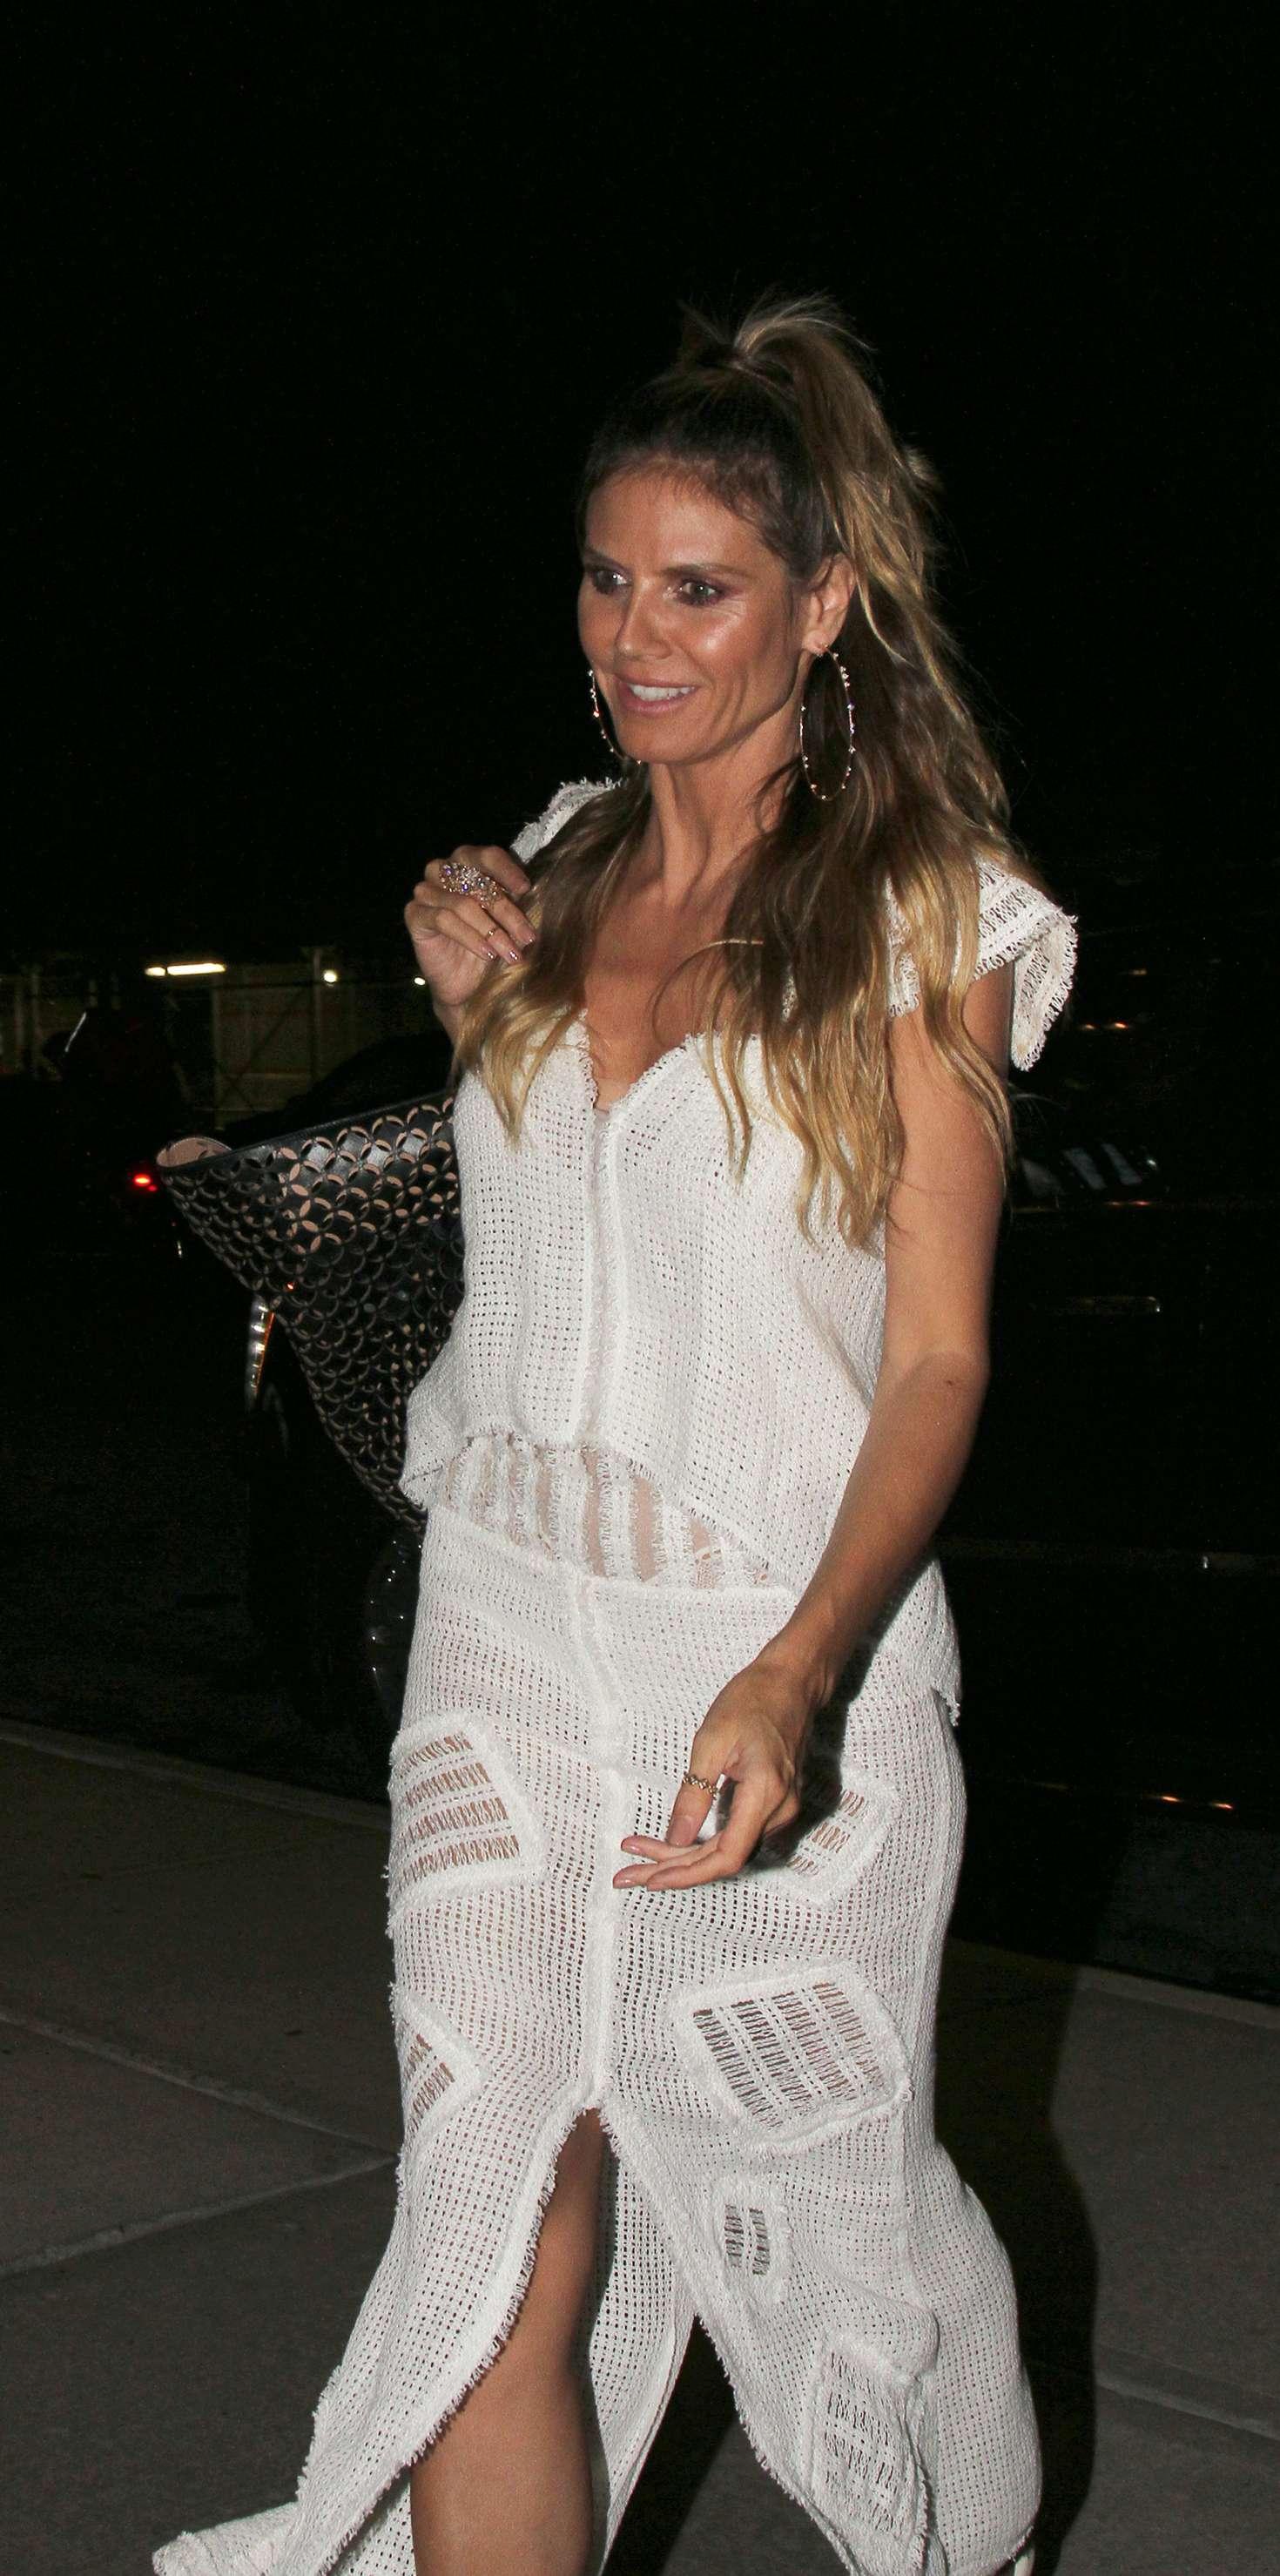 Heidi Klum in White Dress out in New York